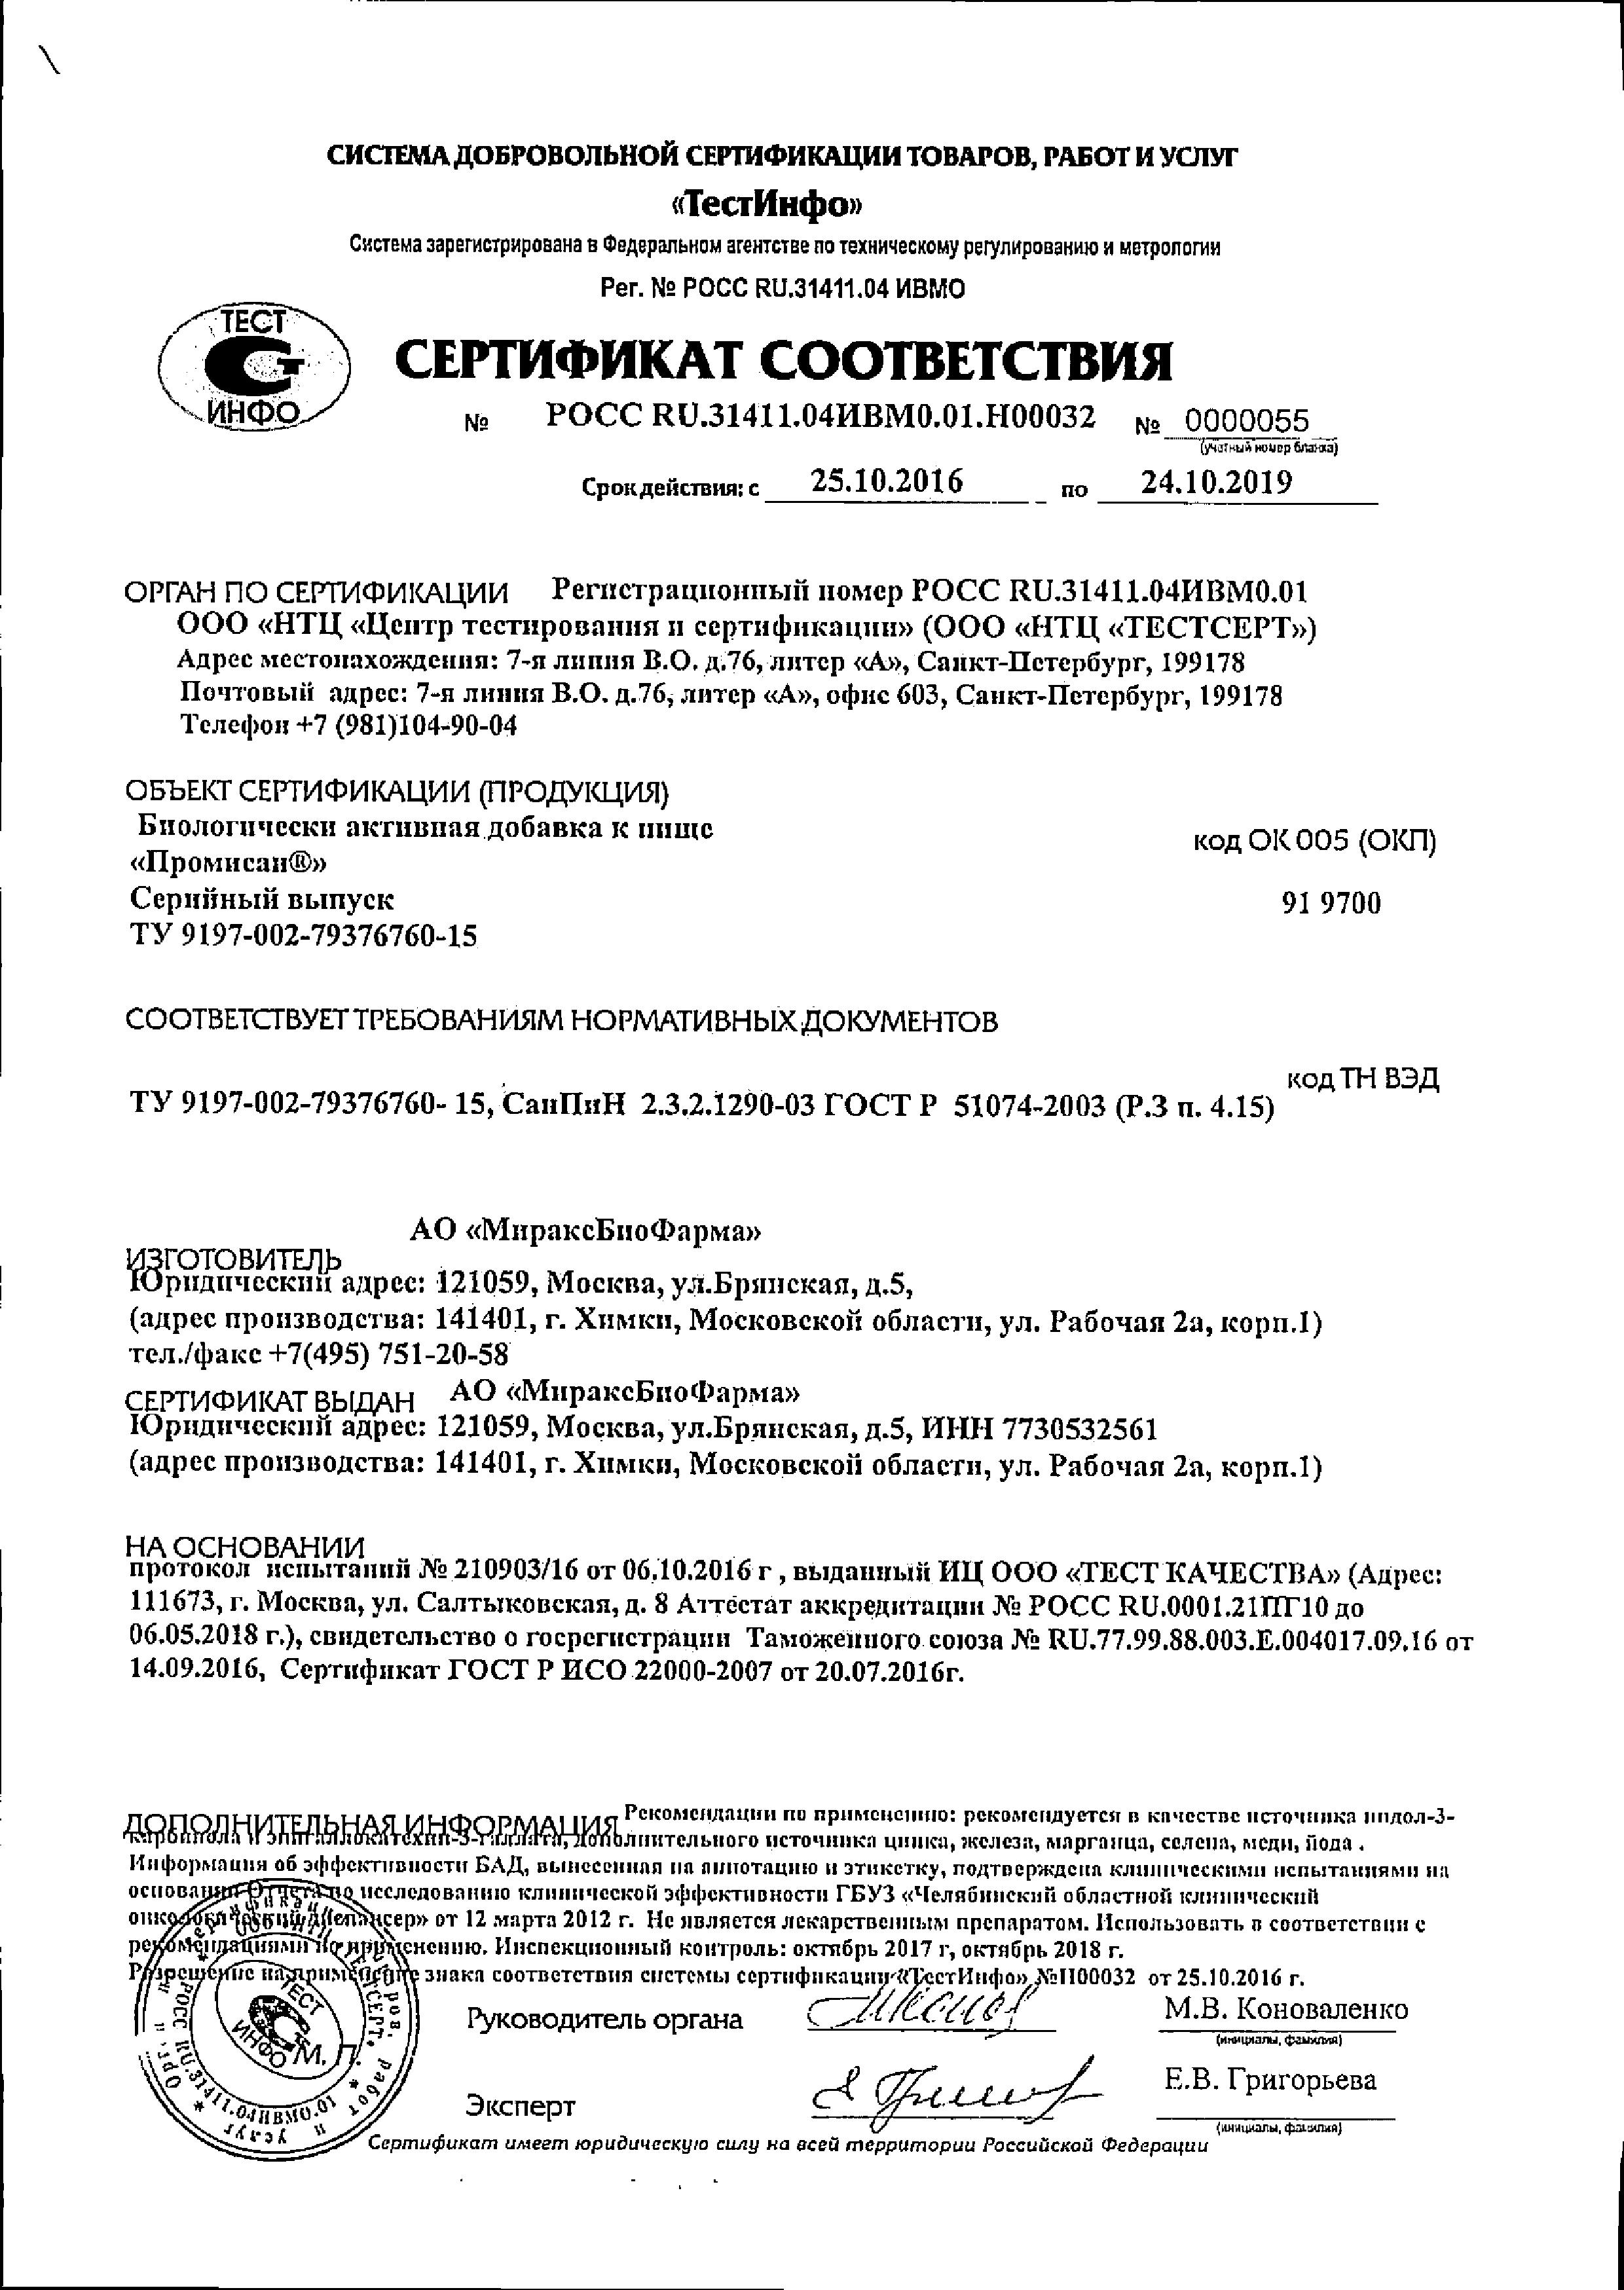 Промисан сертификат